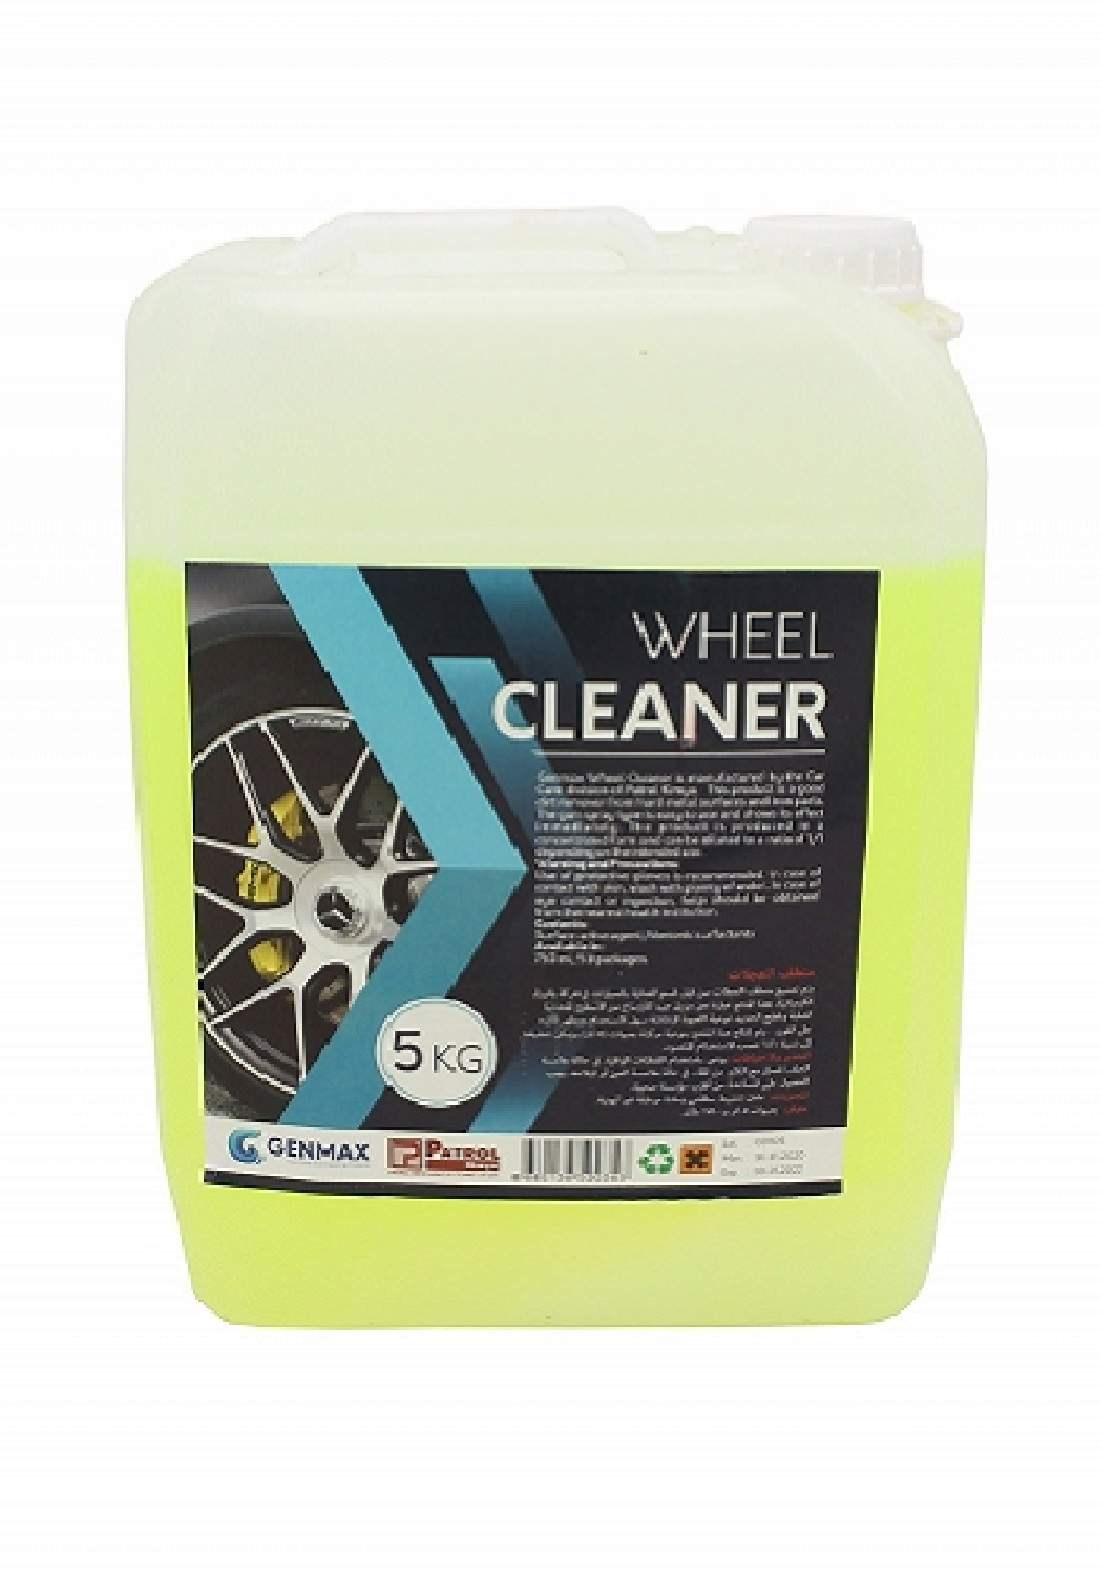 GENMAX WHEEL CLEANER 5Kg منظف عجلة السيارة(ويل) 5 كيلوغرام